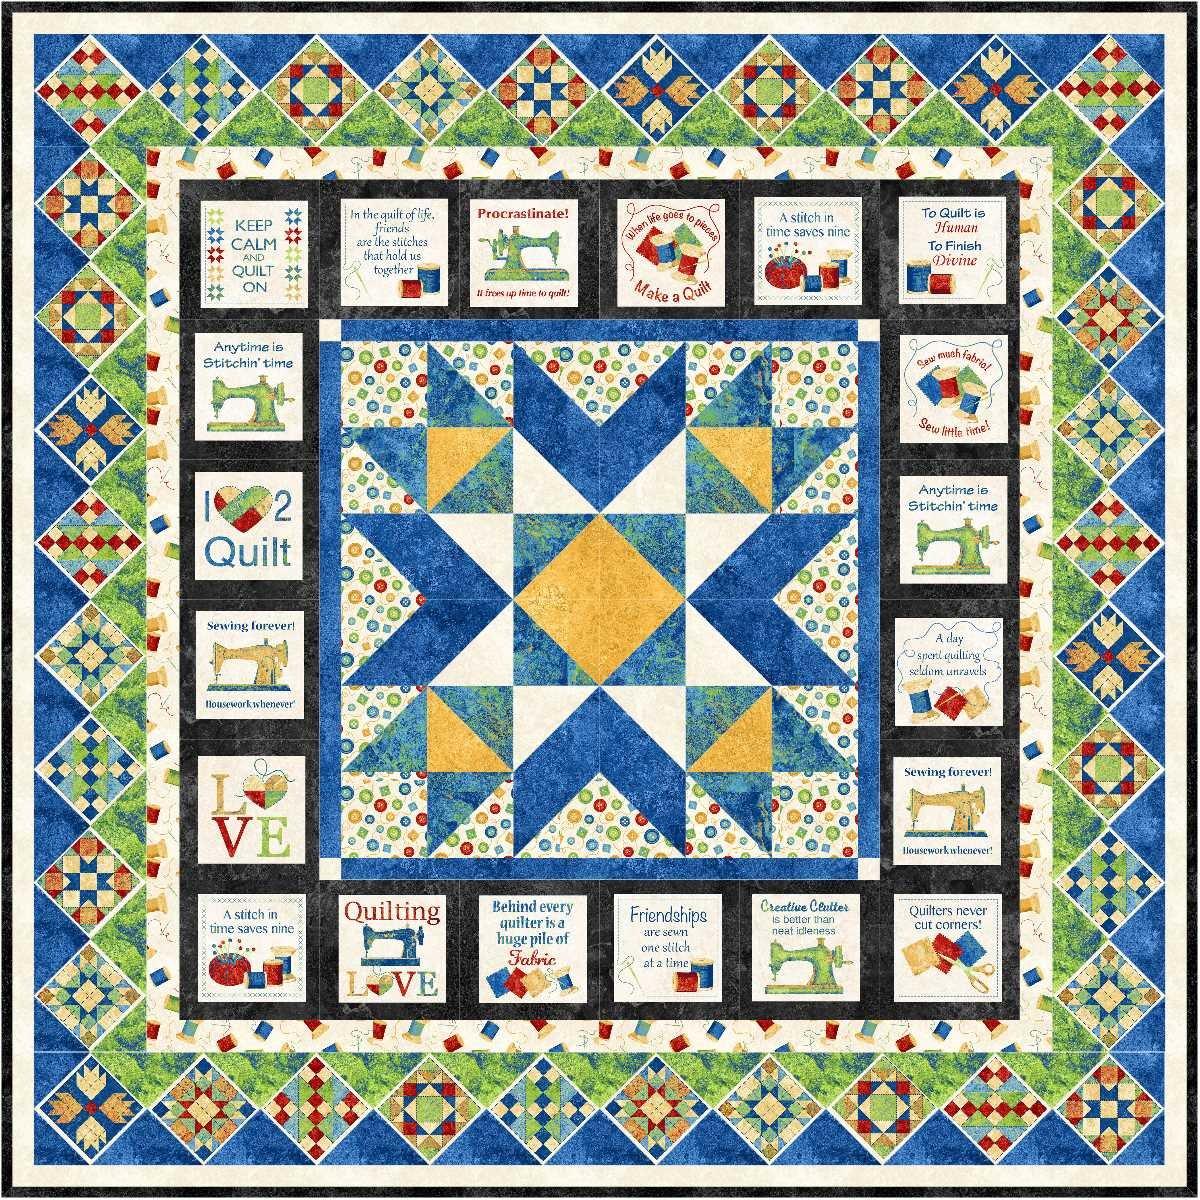 my original artwork design Cape Dorset northern theme fabric quilting block fabric square,8X8 inch,cotton,pillow block,art journal